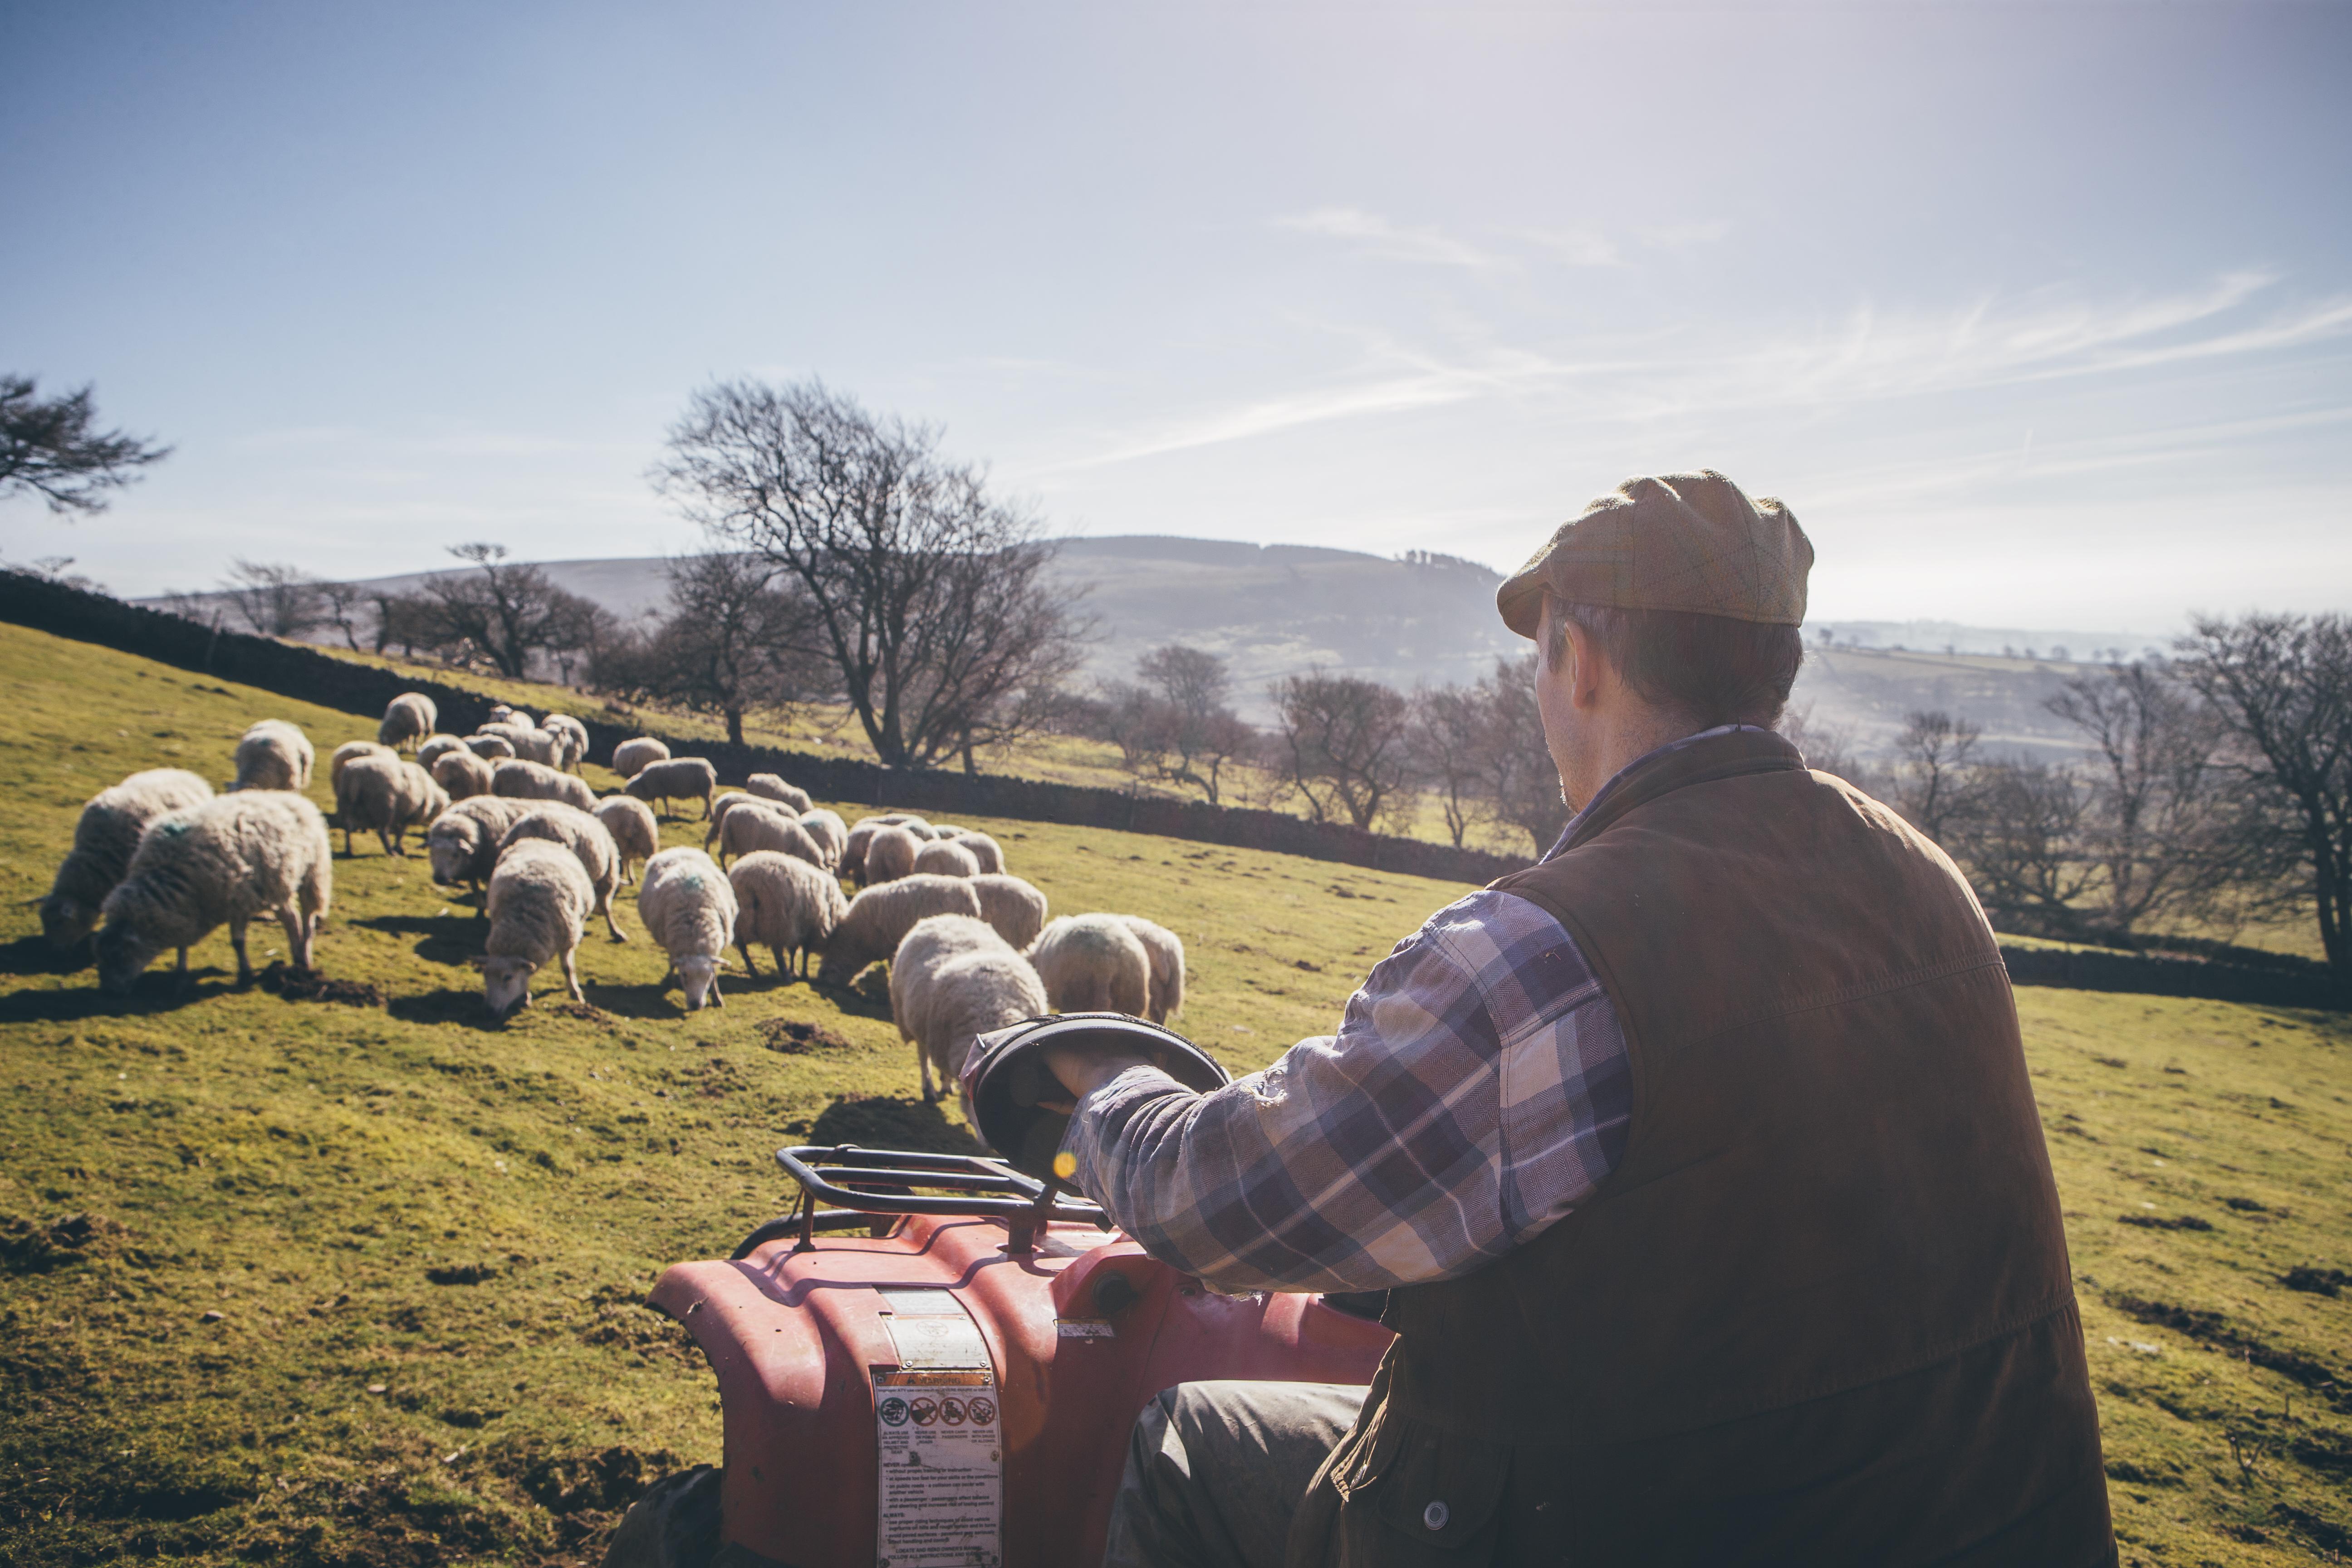 farmer on atv tending his sheep